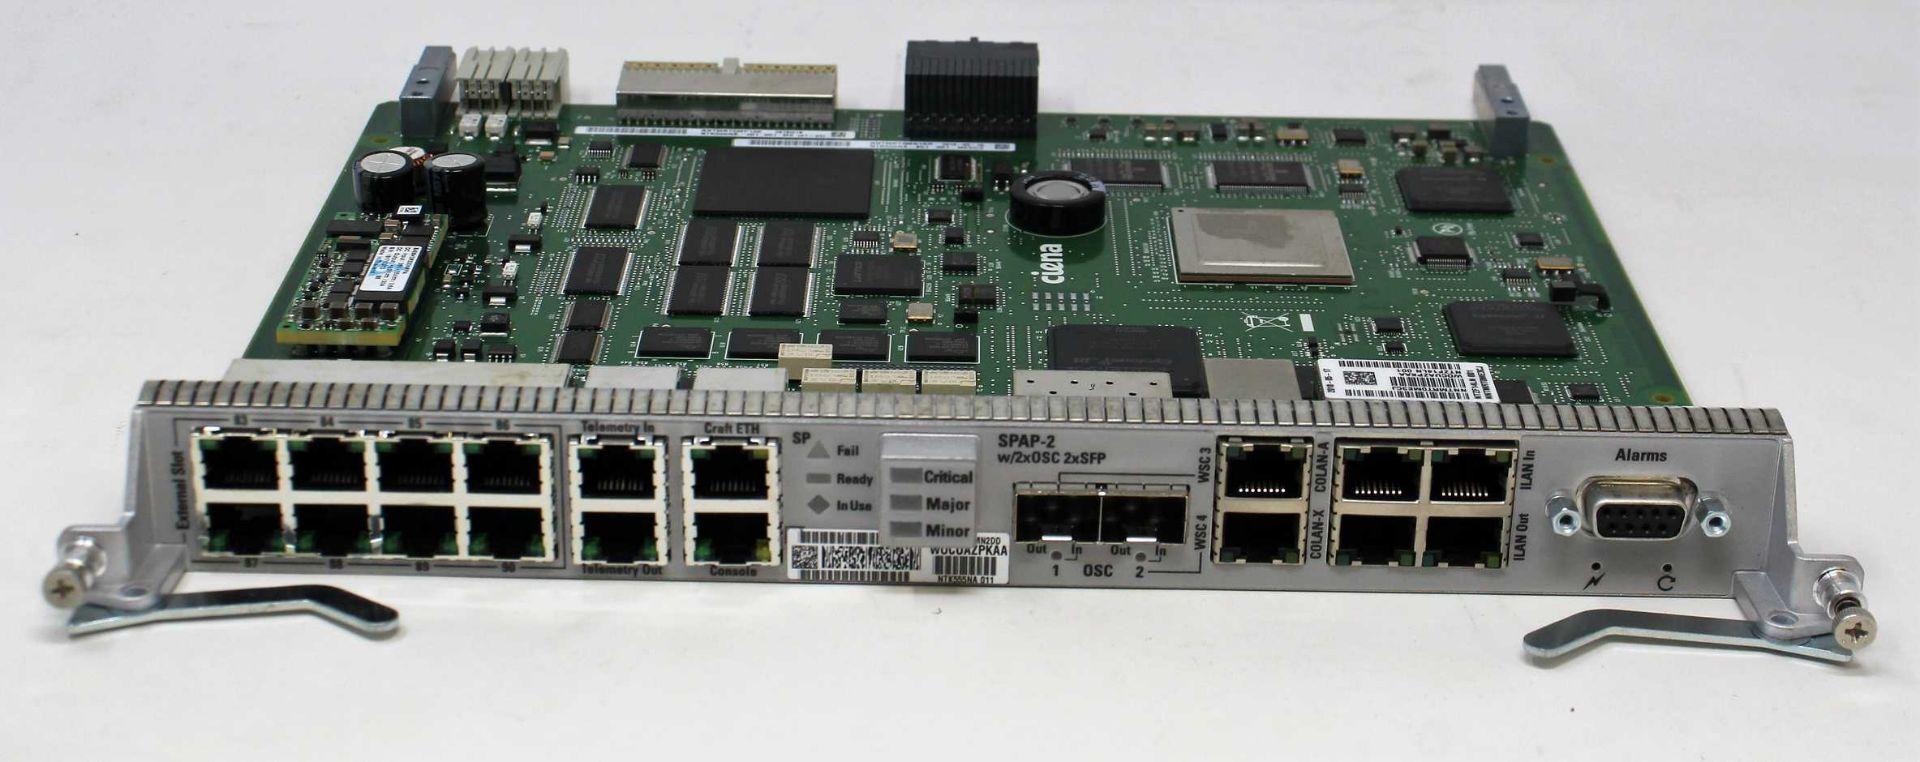 A pre-owned Ciena NTK555NA WOCUAZPKAA SPAP-2 w/2x0SC 2xSFP Shelf Processor (Untested, sold as